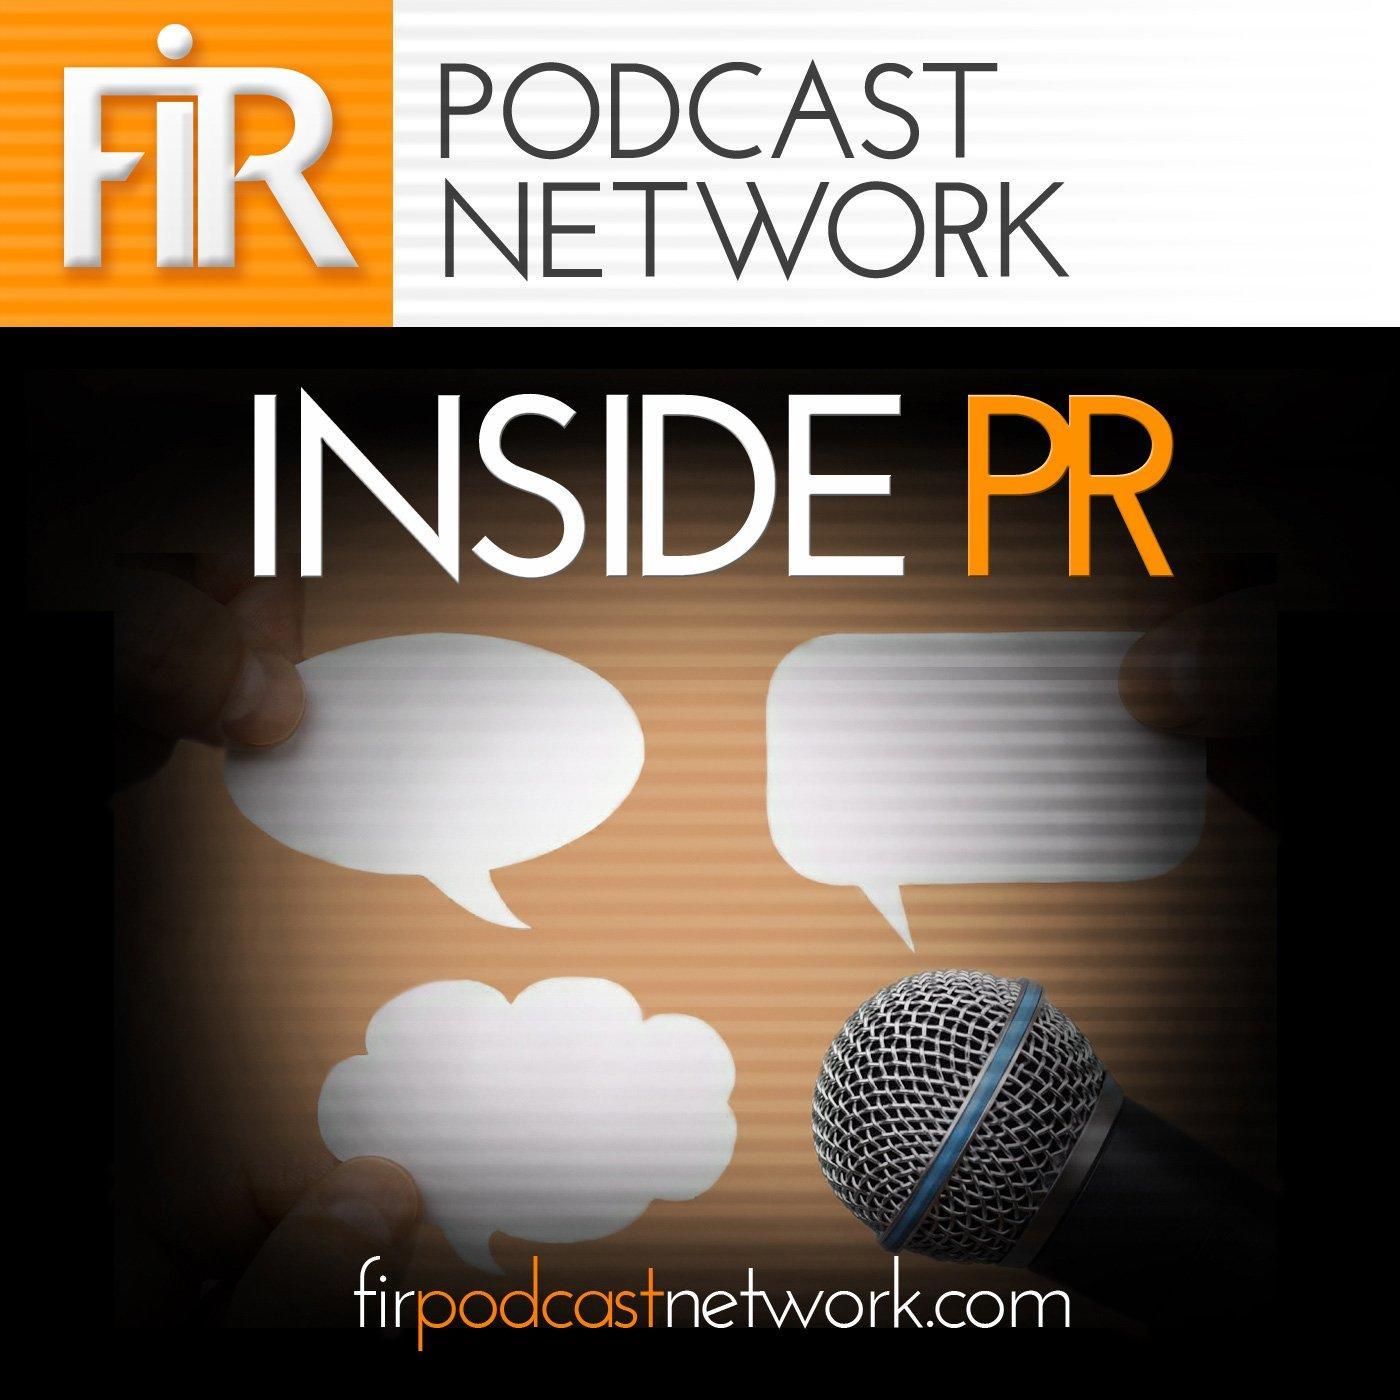 Inside PR 465: We make it Virtual